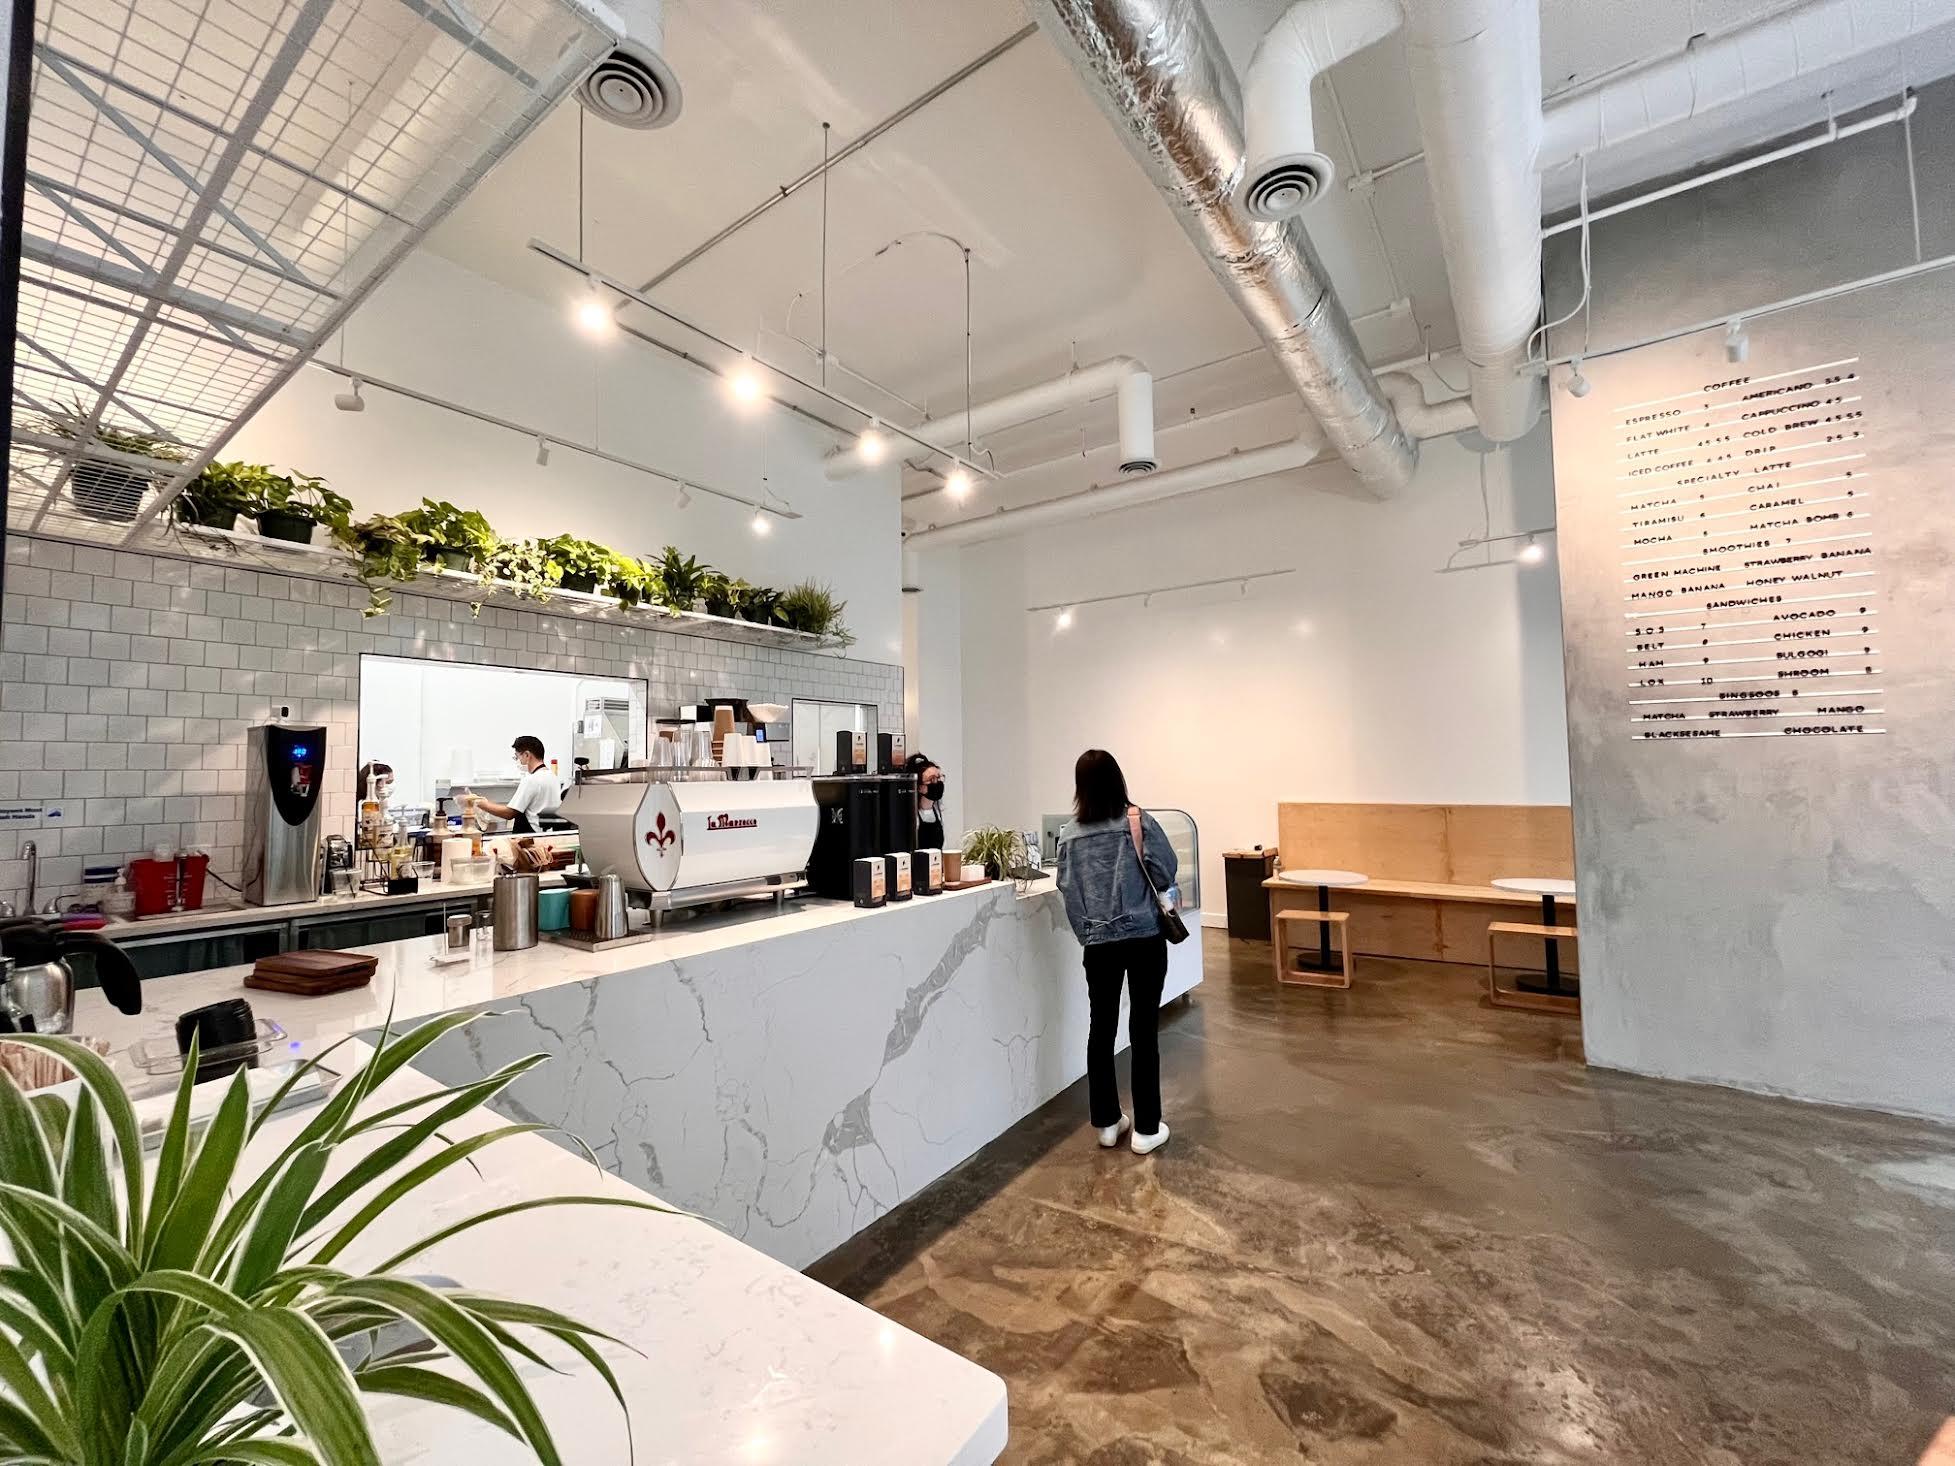 Semicolon Cafe in Bellevue